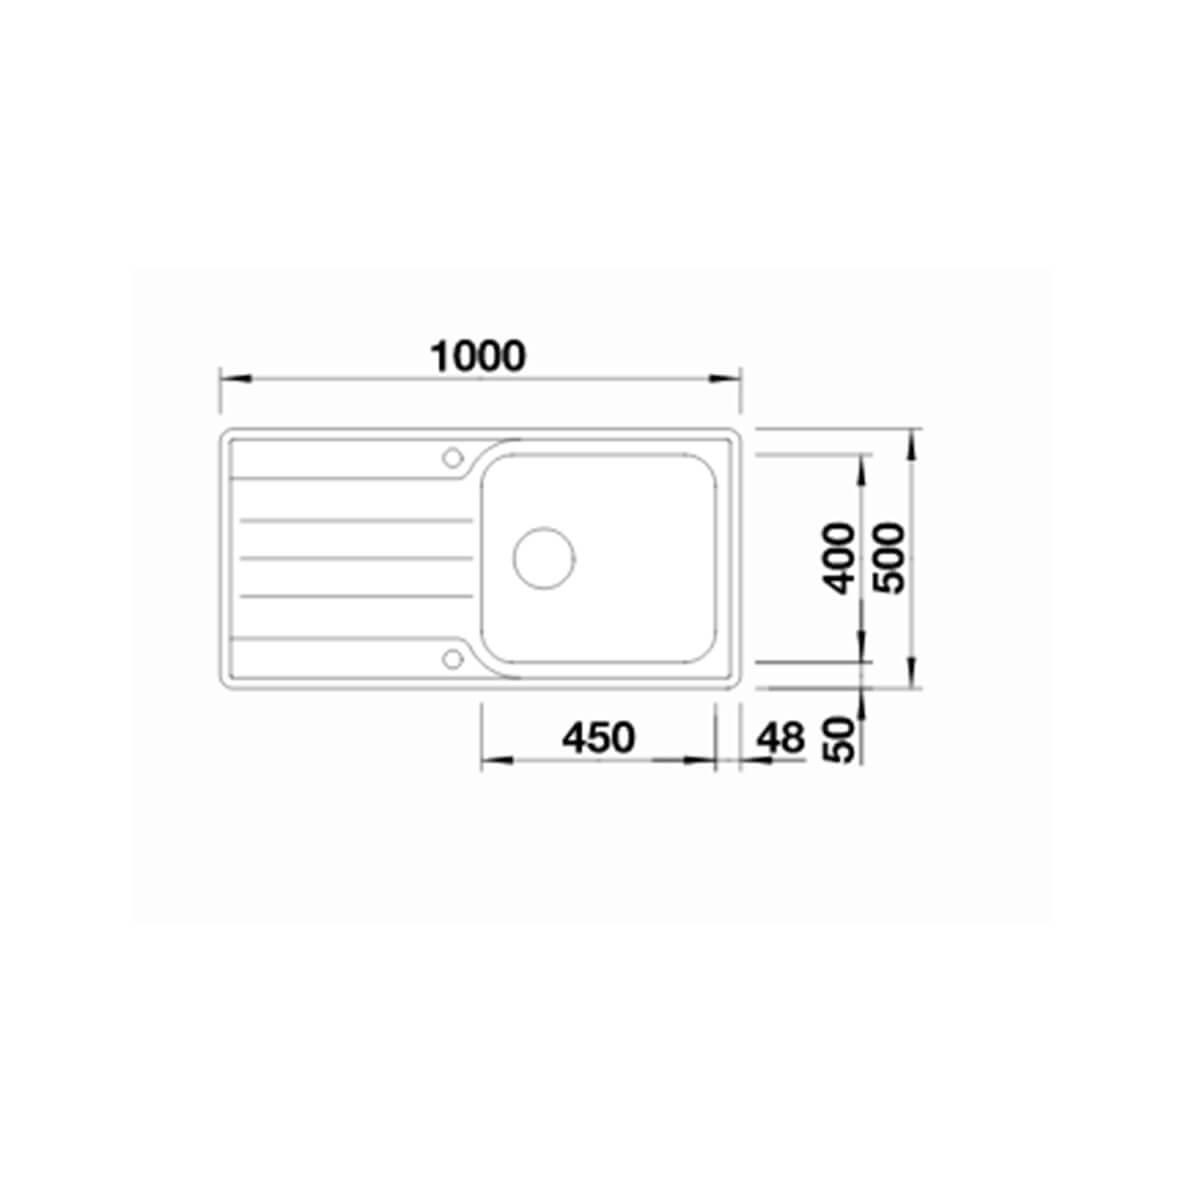 BLANCO ΑΝΟΞΕΙΔΩΤΟΣ ΝΕΡΟΧΥΤΗΣ ΕΝΘΕΤΟΣ MEDIAN XL 6 S-IF ΛΕΙΟΣ ΓΟΥΡΝΑ ΔΕΞΙΑ (100x50) 3